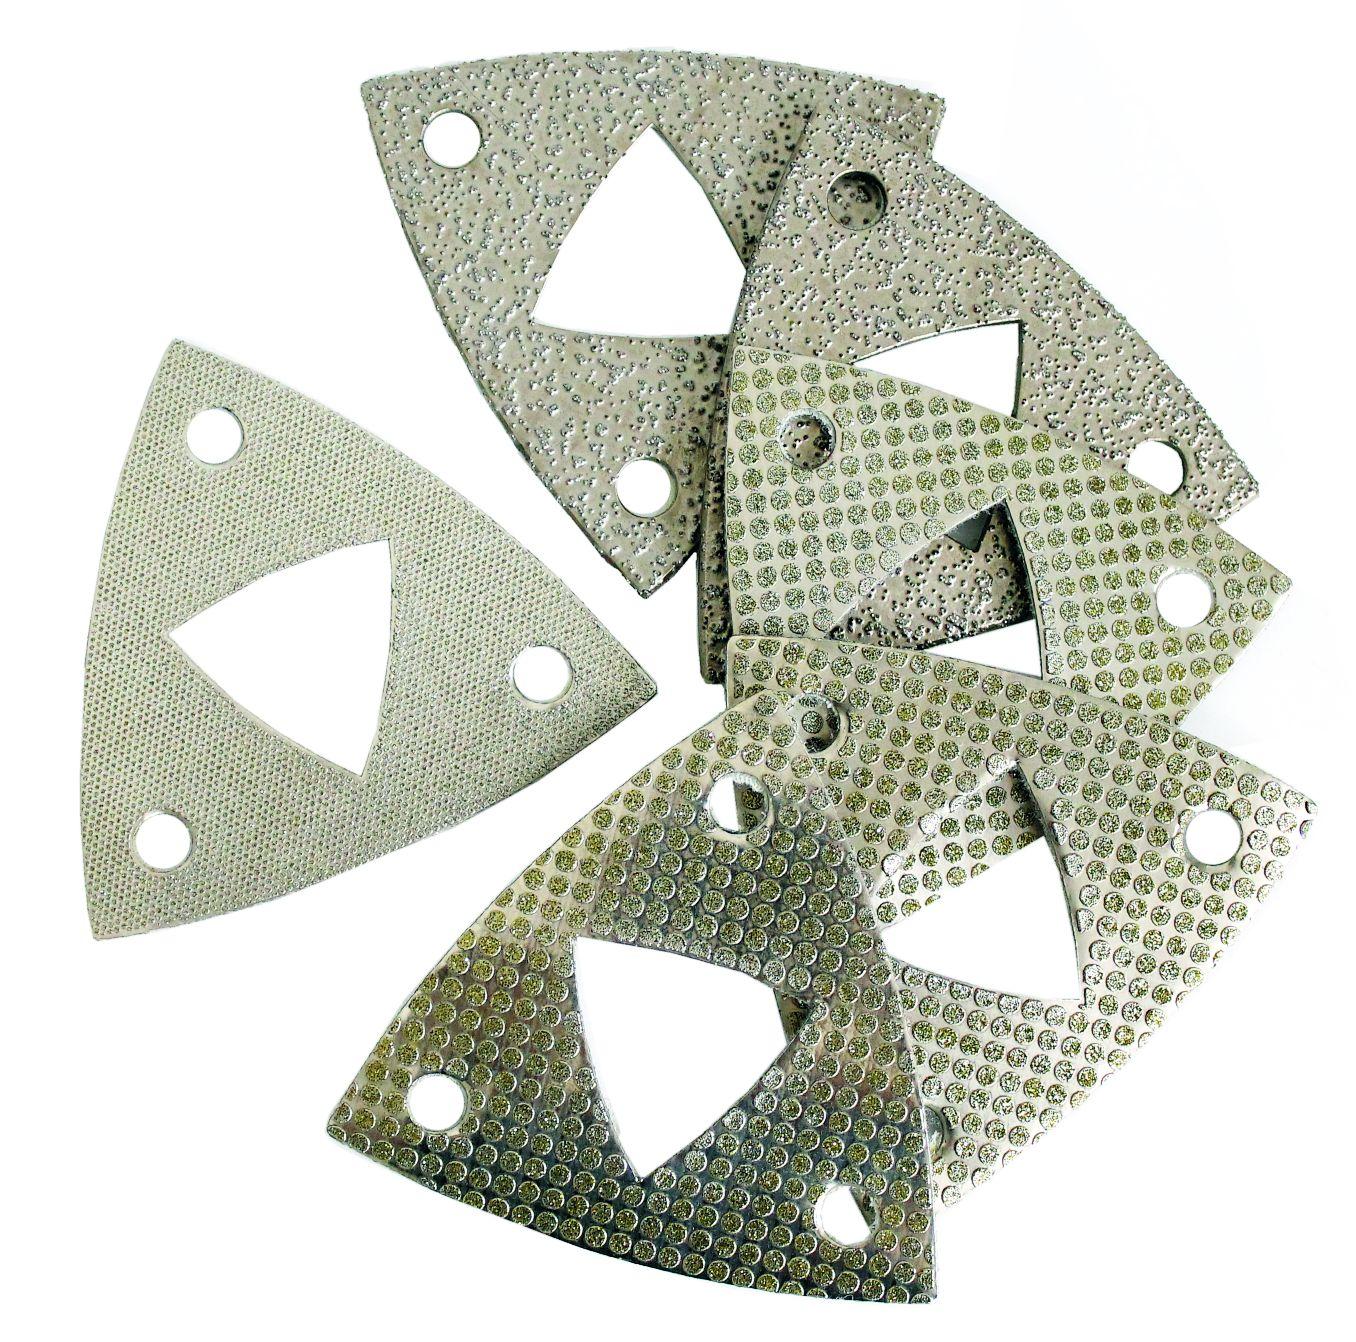 janser gmbh professionelle fussbodentechnik klett diamant schleifpapier multi master k rnung. Black Bedroom Furniture Sets. Home Design Ideas